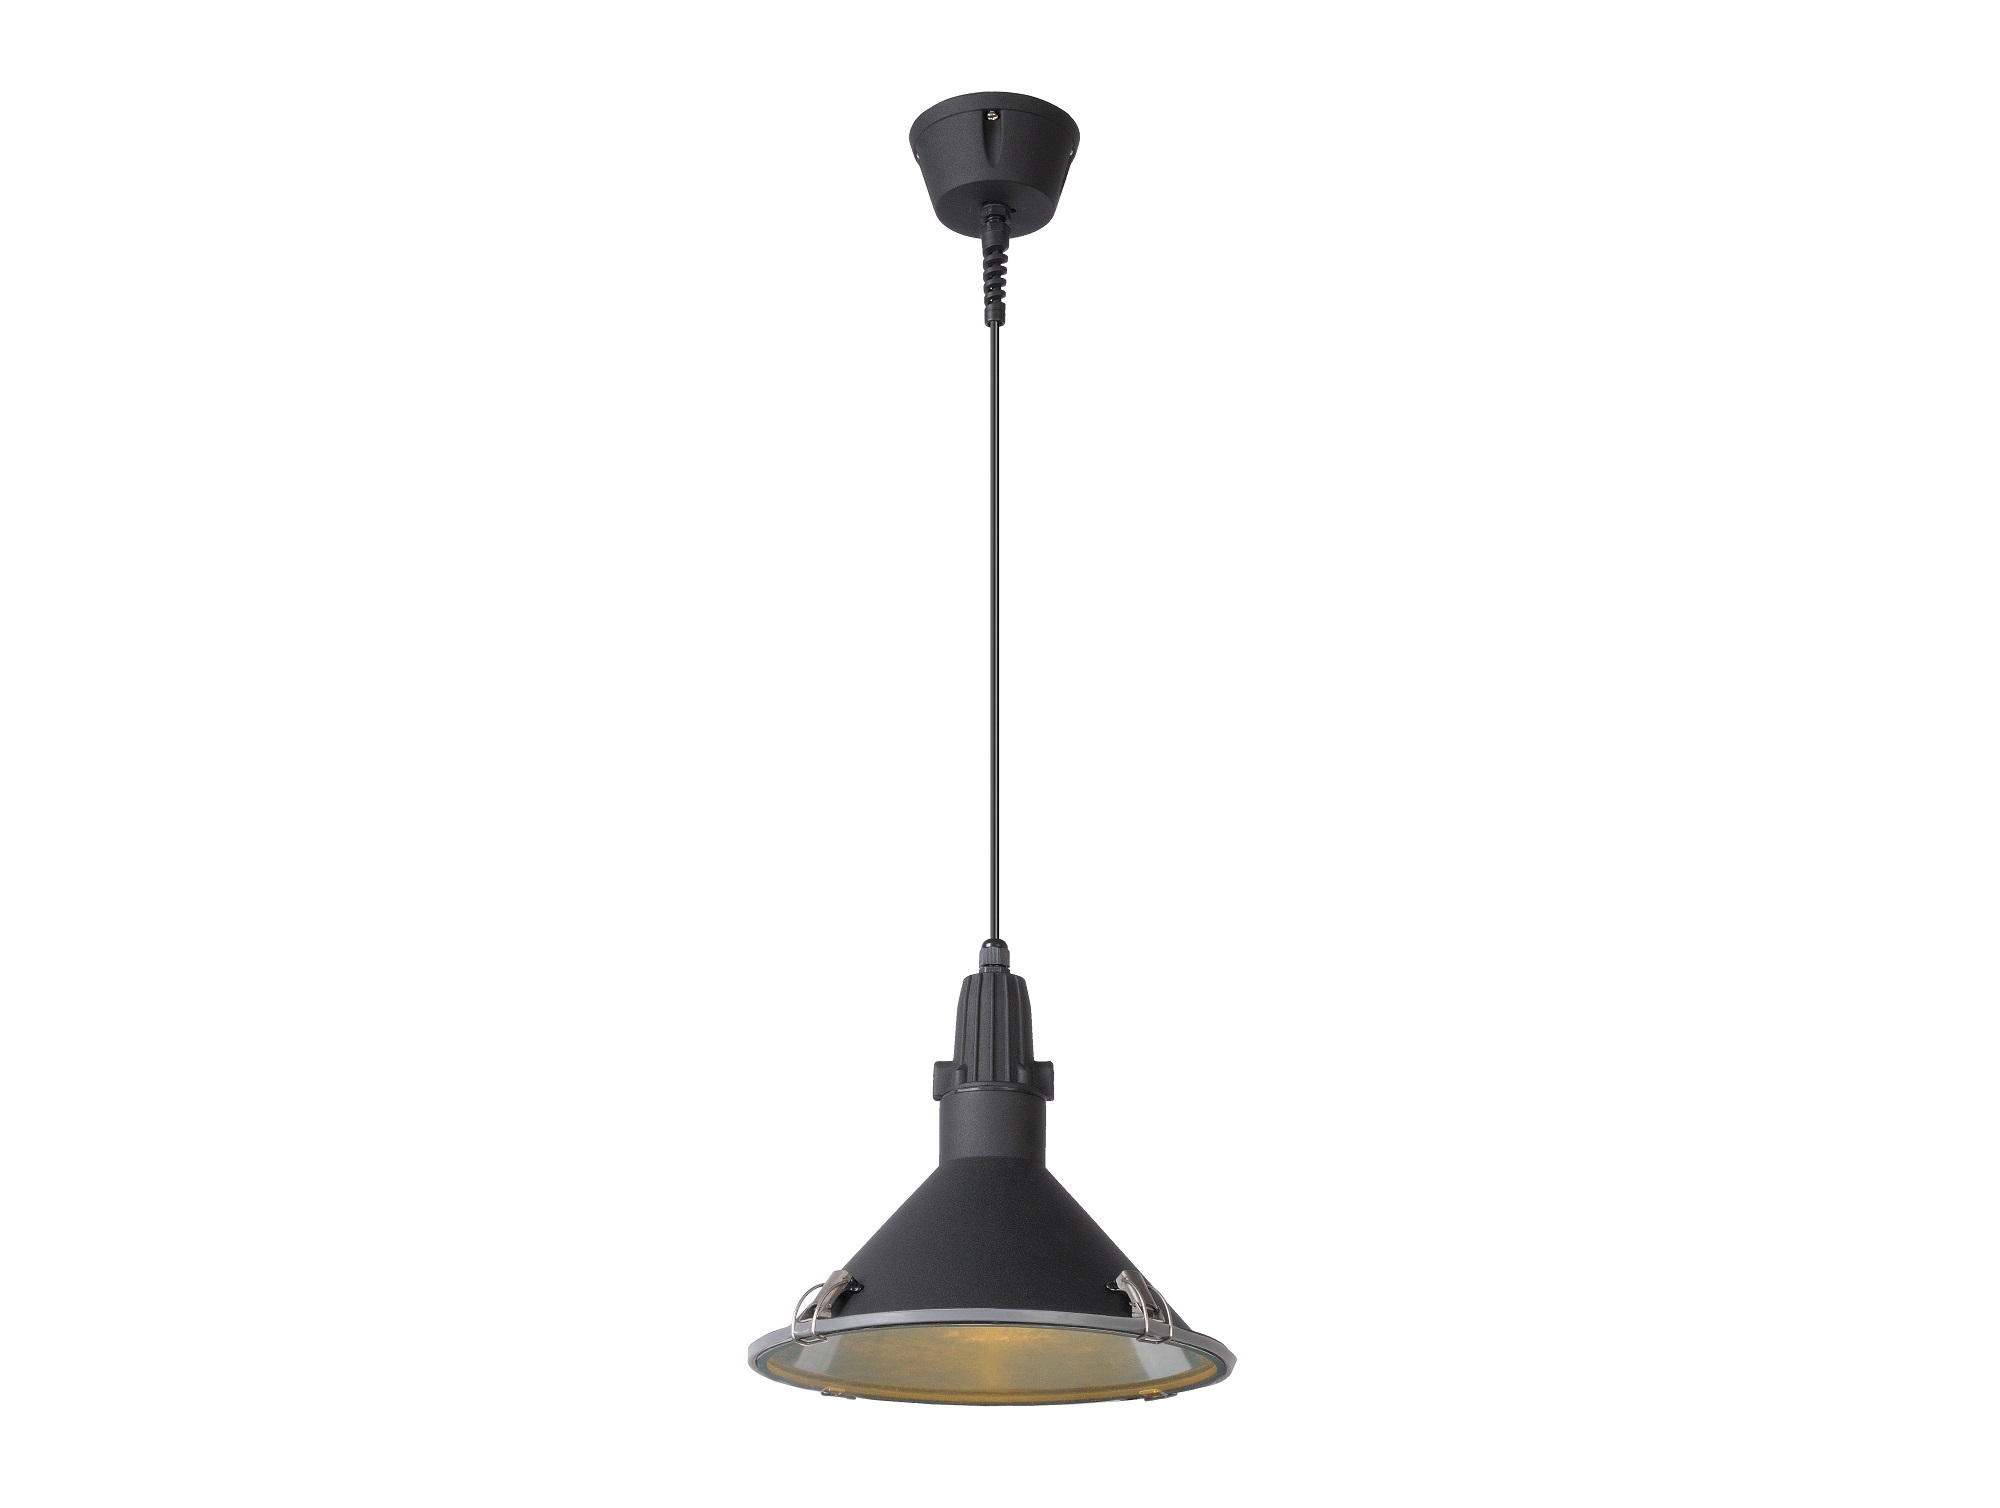 Подвесной светильник TongaПодвесные светильники<br>&amp;lt;div&amp;gt;&amp;lt;div&amp;gt;Вид цоколя: E27&amp;lt;/div&amp;gt;&amp;lt;div&amp;gt;Мощность: &amp;amp;nbsp;60W&amp;amp;nbsp;&amp;lt;/div&amp;gt;&amp;lt;div&amp;gt;Количество ламп: 1 (нет в комплекте)&amp;lt;/div&amp;gt;&amp;lt;/div&amp;gt;<br><br>Material: Металл<br>Высота см: 202